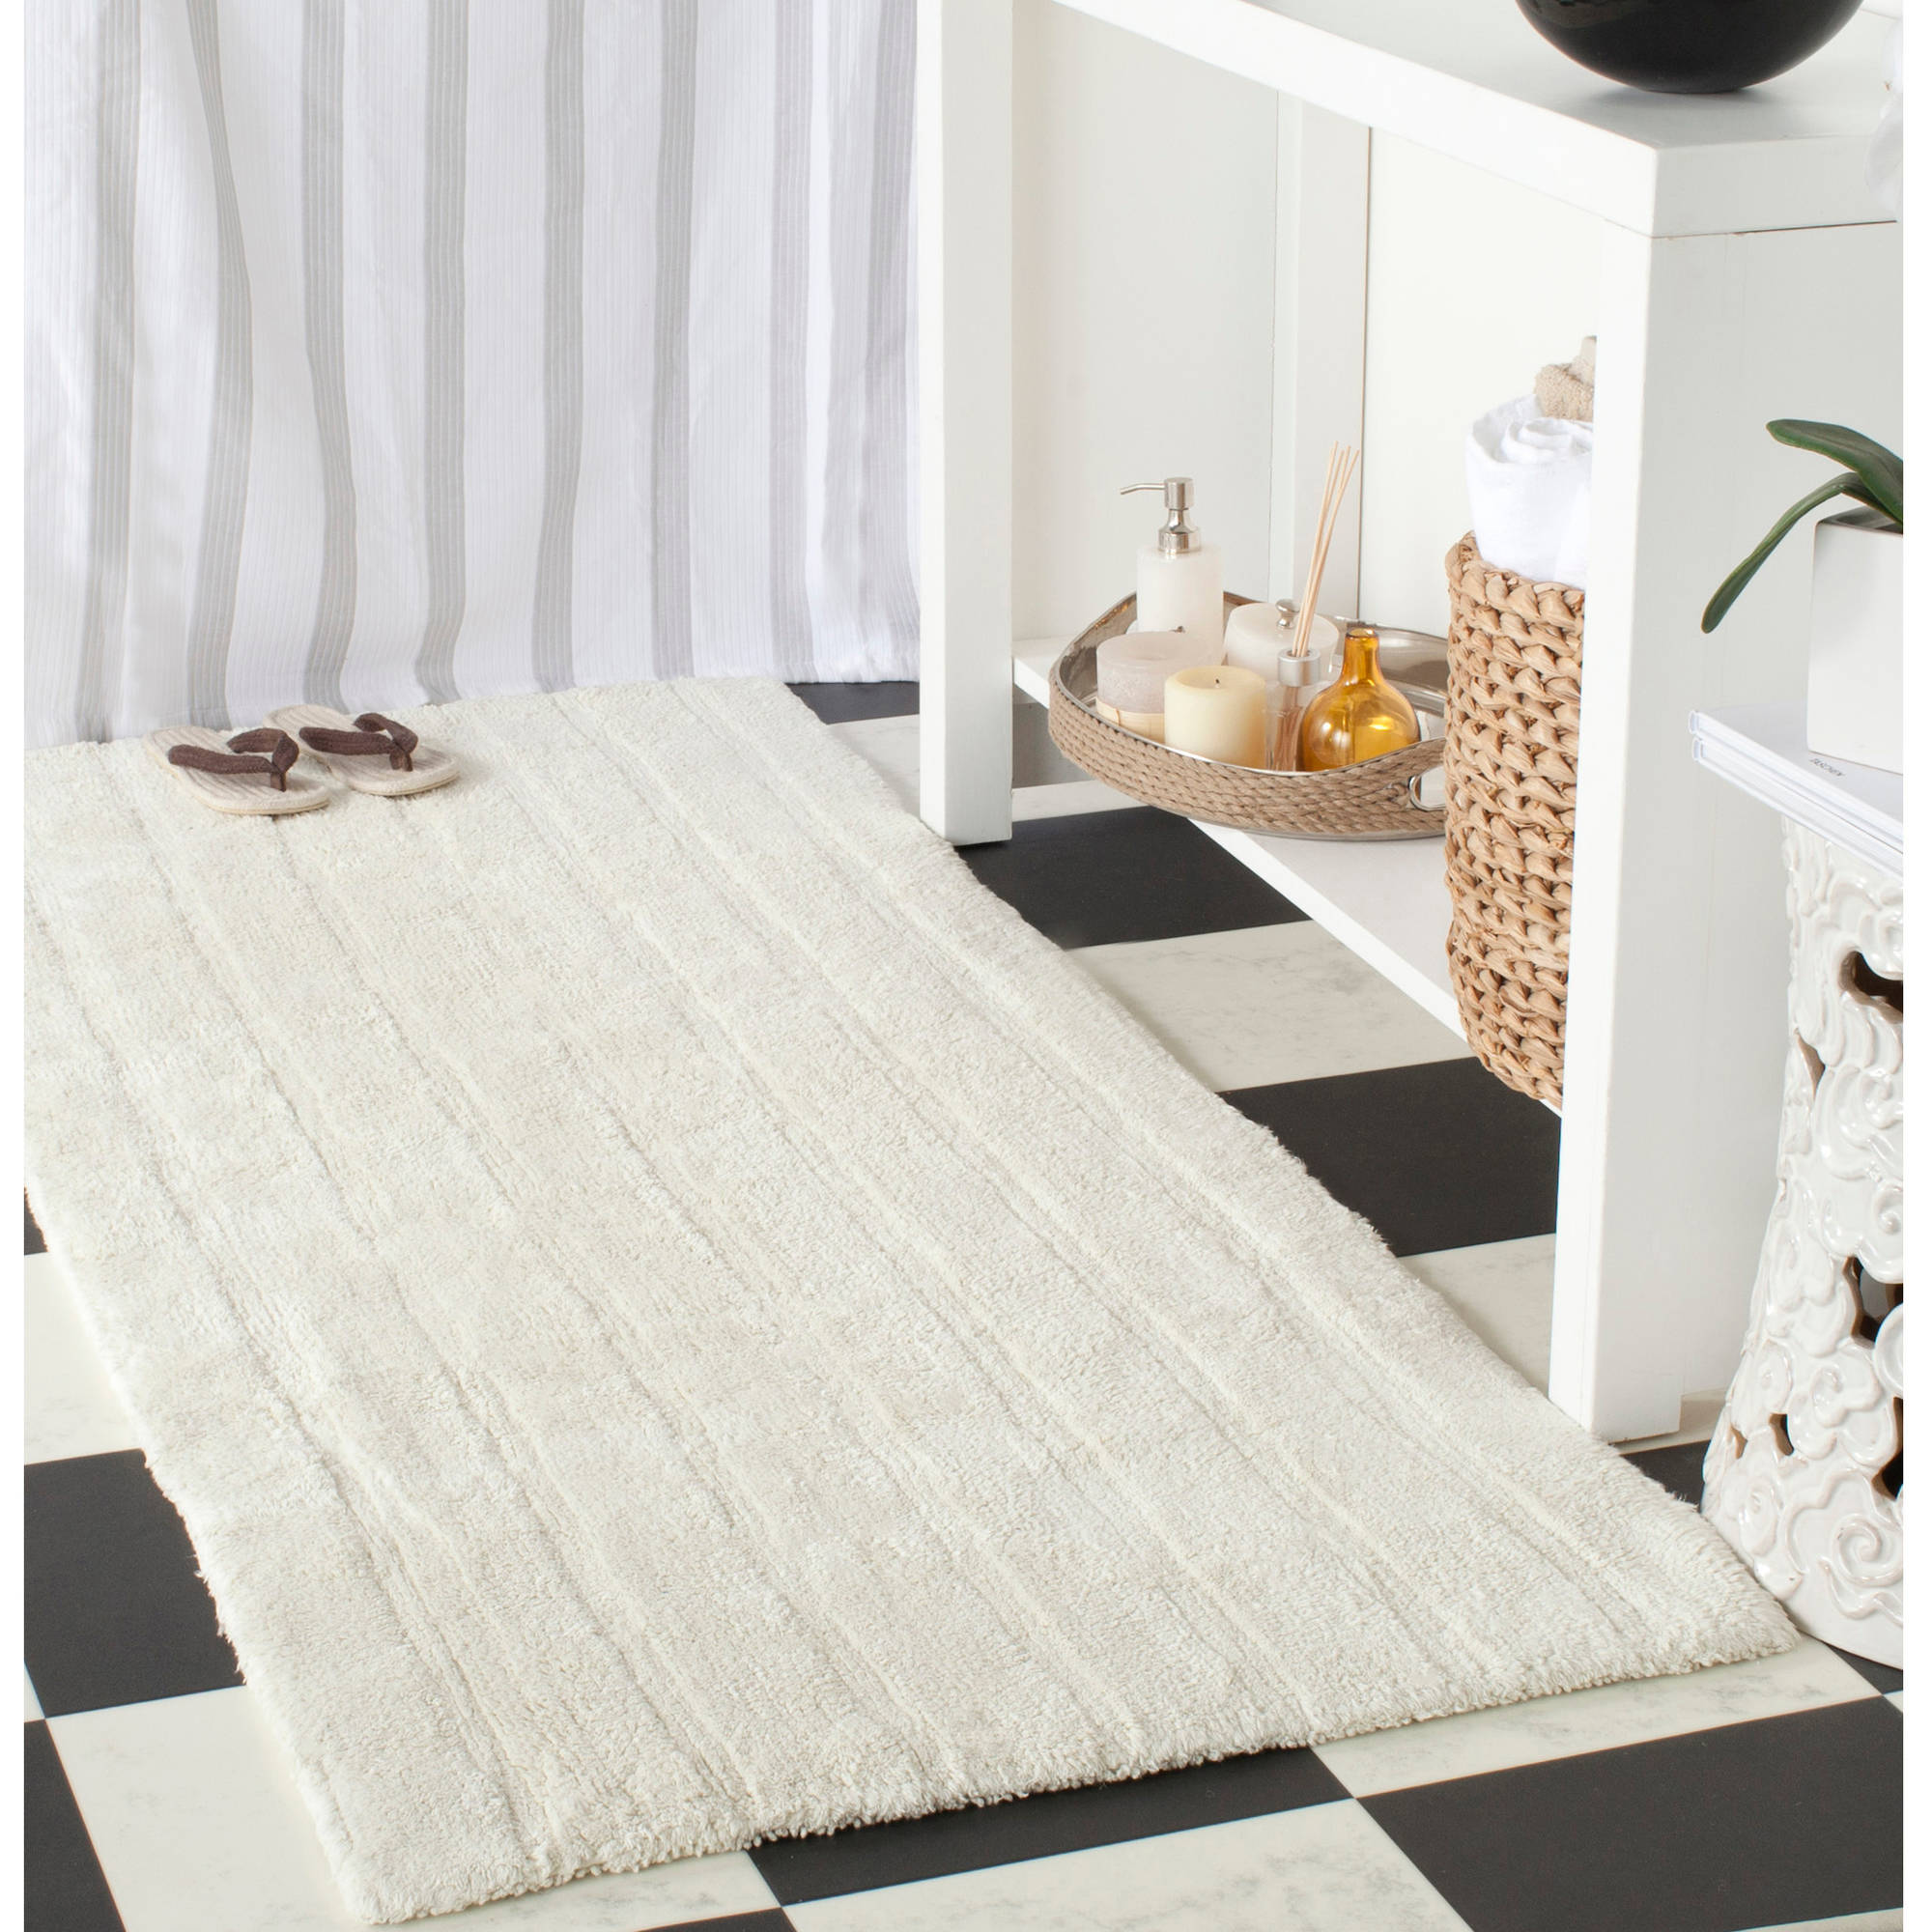 safavieh plush master cotton bath rugs 2pk